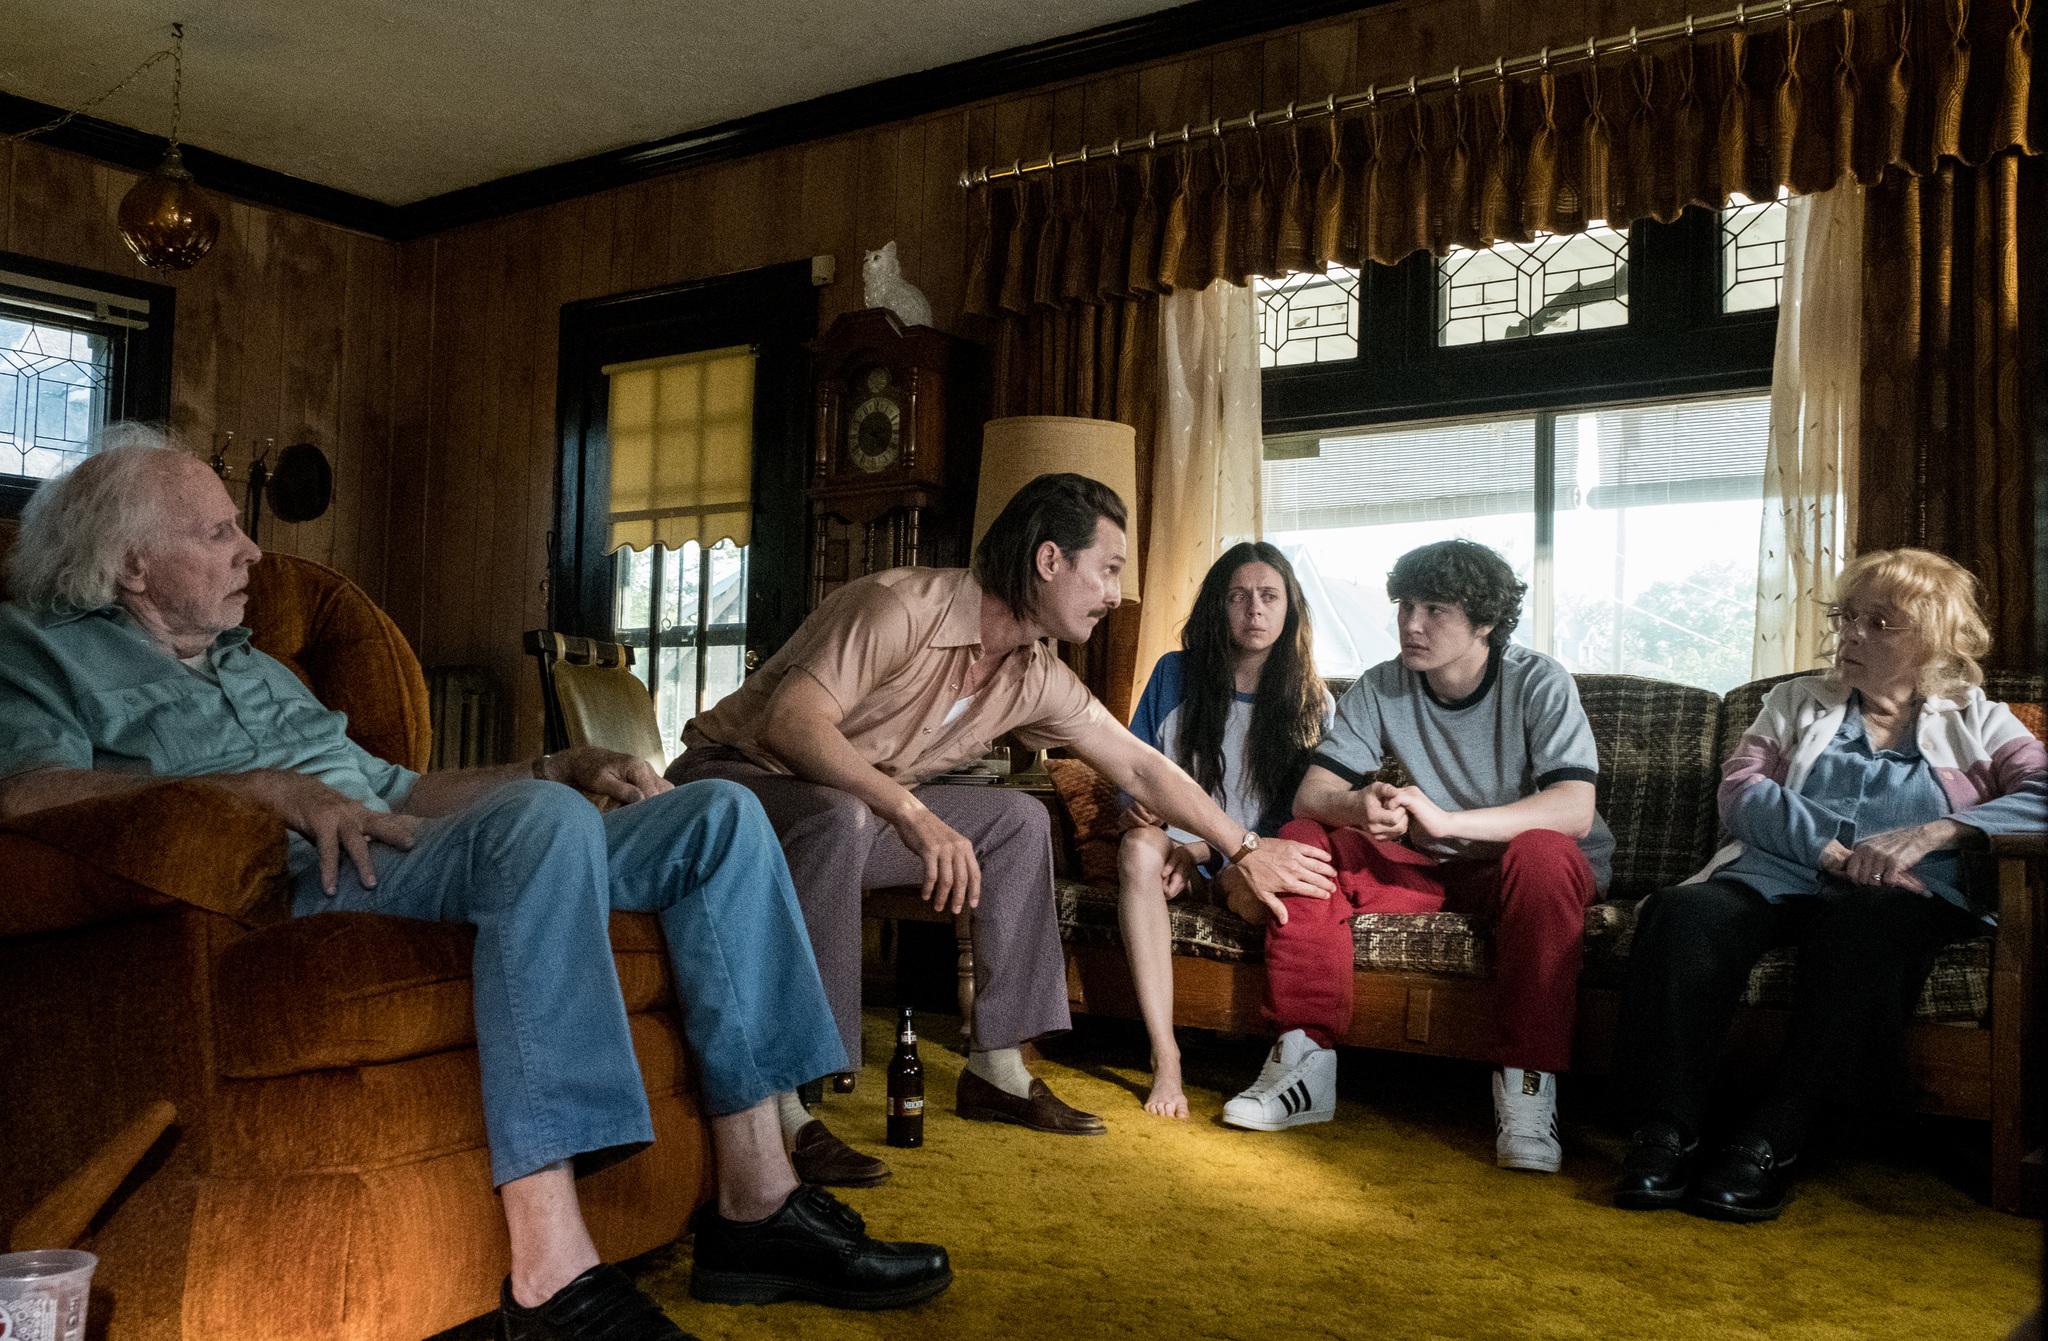 Matthew McConaughey, Bruce Dern, Piper Laurie, Bel Powley, and Richie Merritt in White Boy Rick (2018)